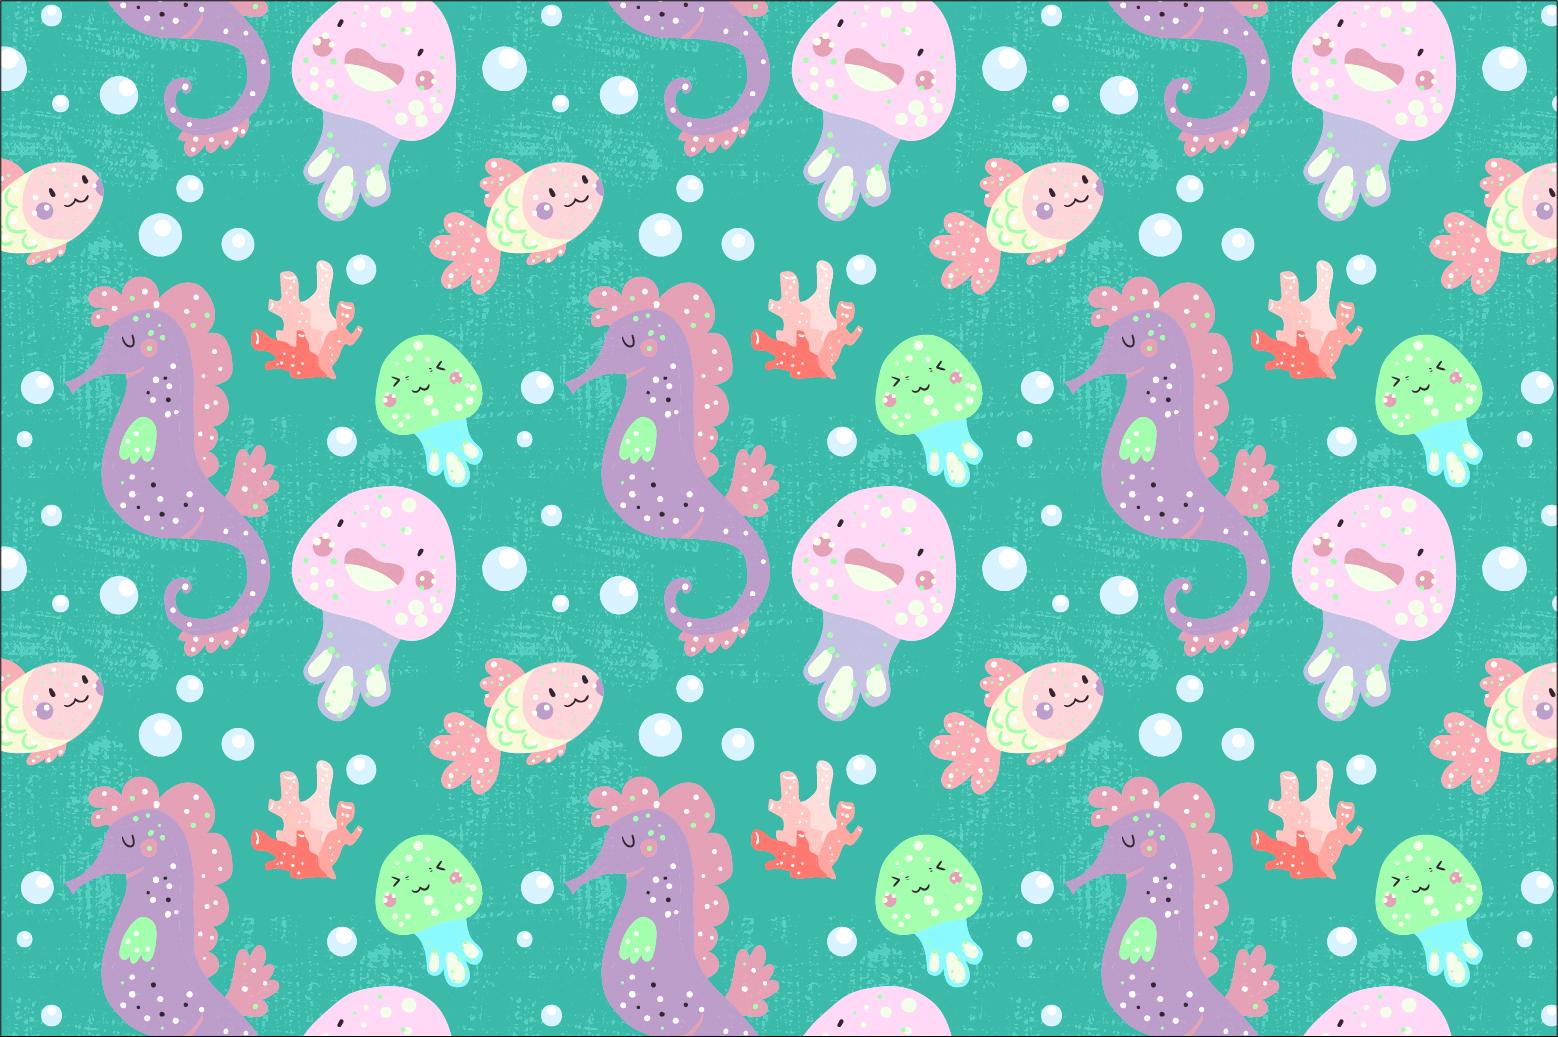 Sea Cuties example image 2